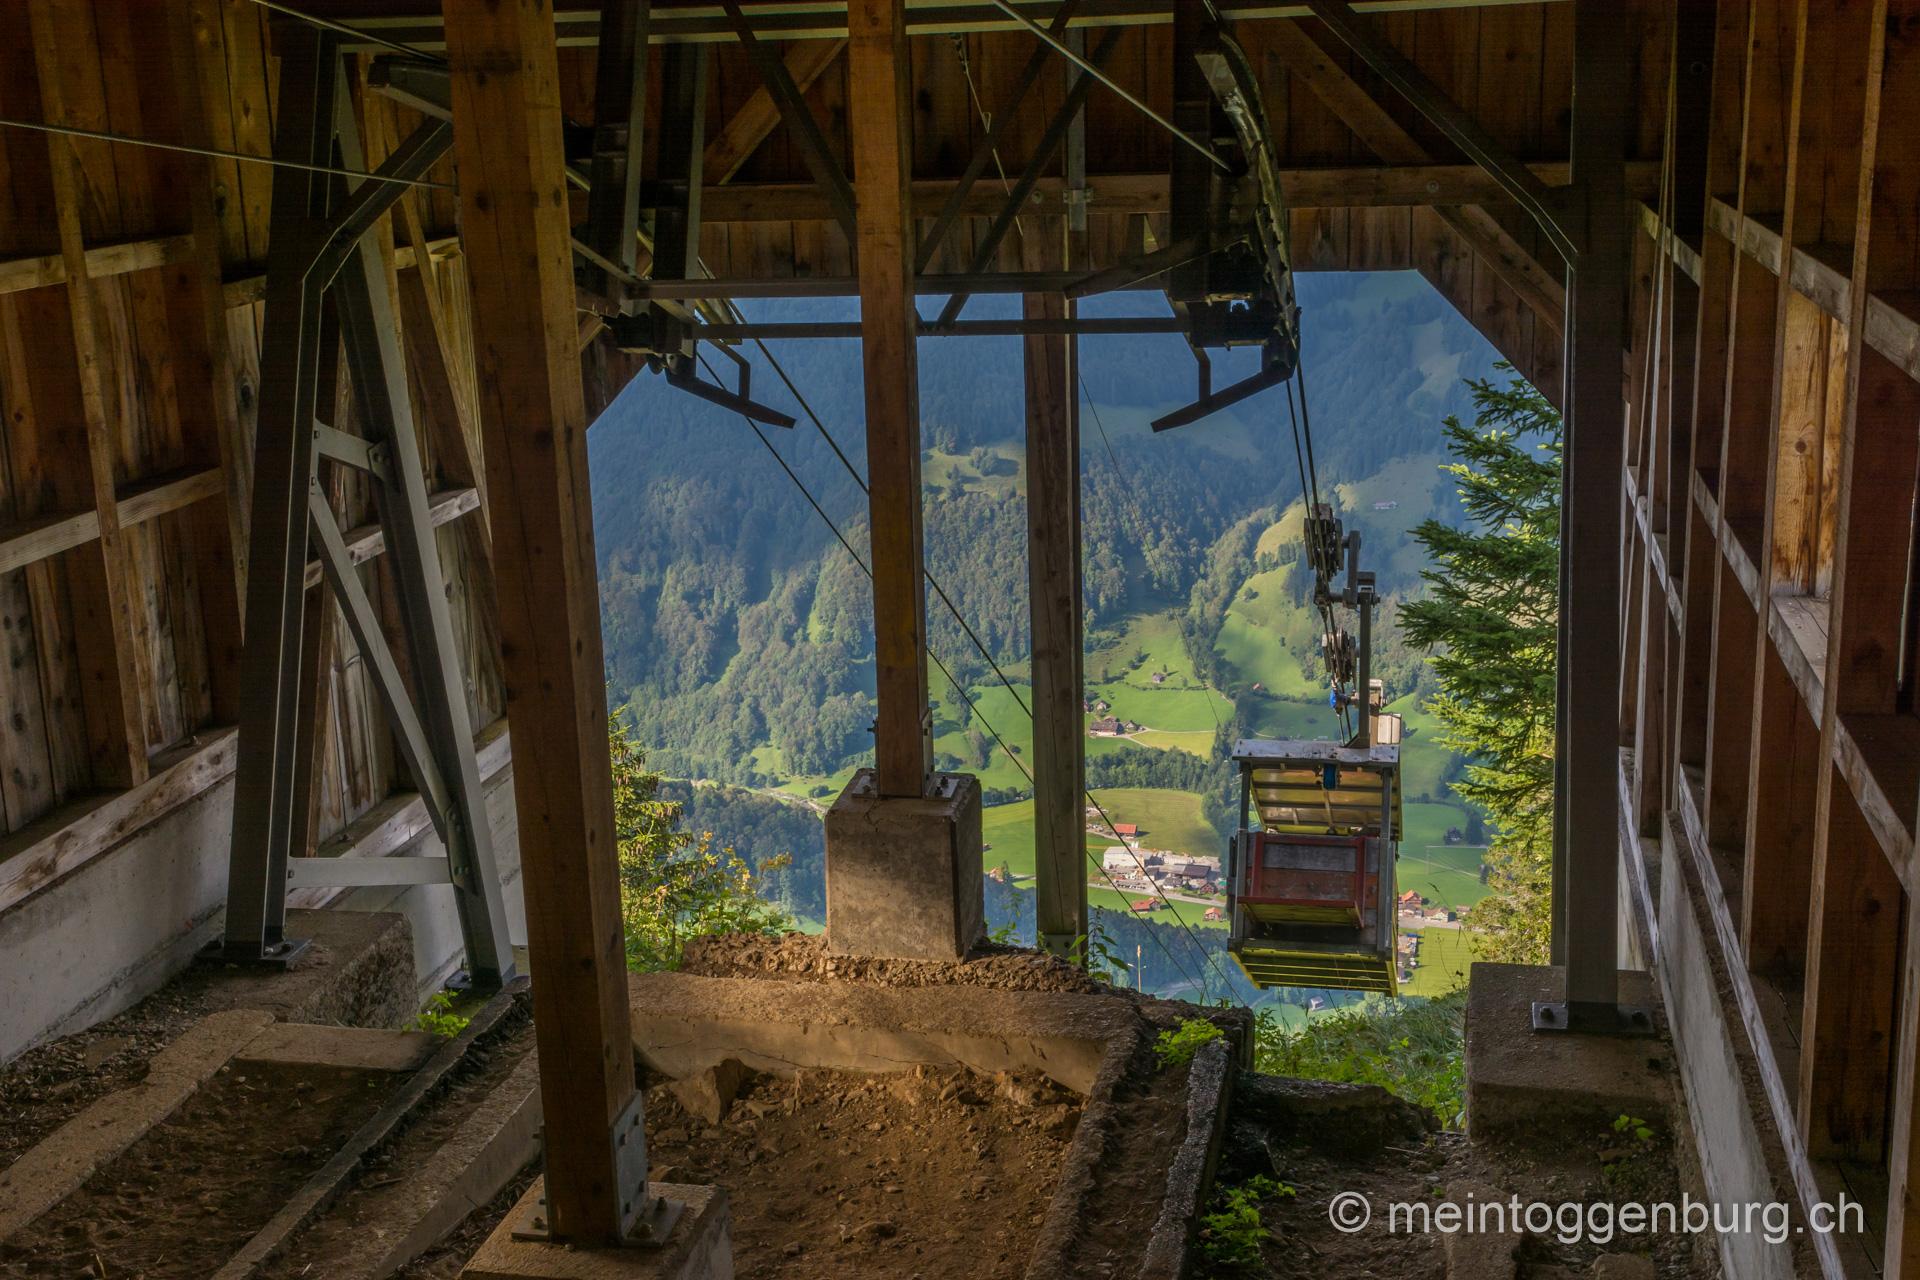 Wanderung auf den Selun - Kistenbahn nach Starkenbach